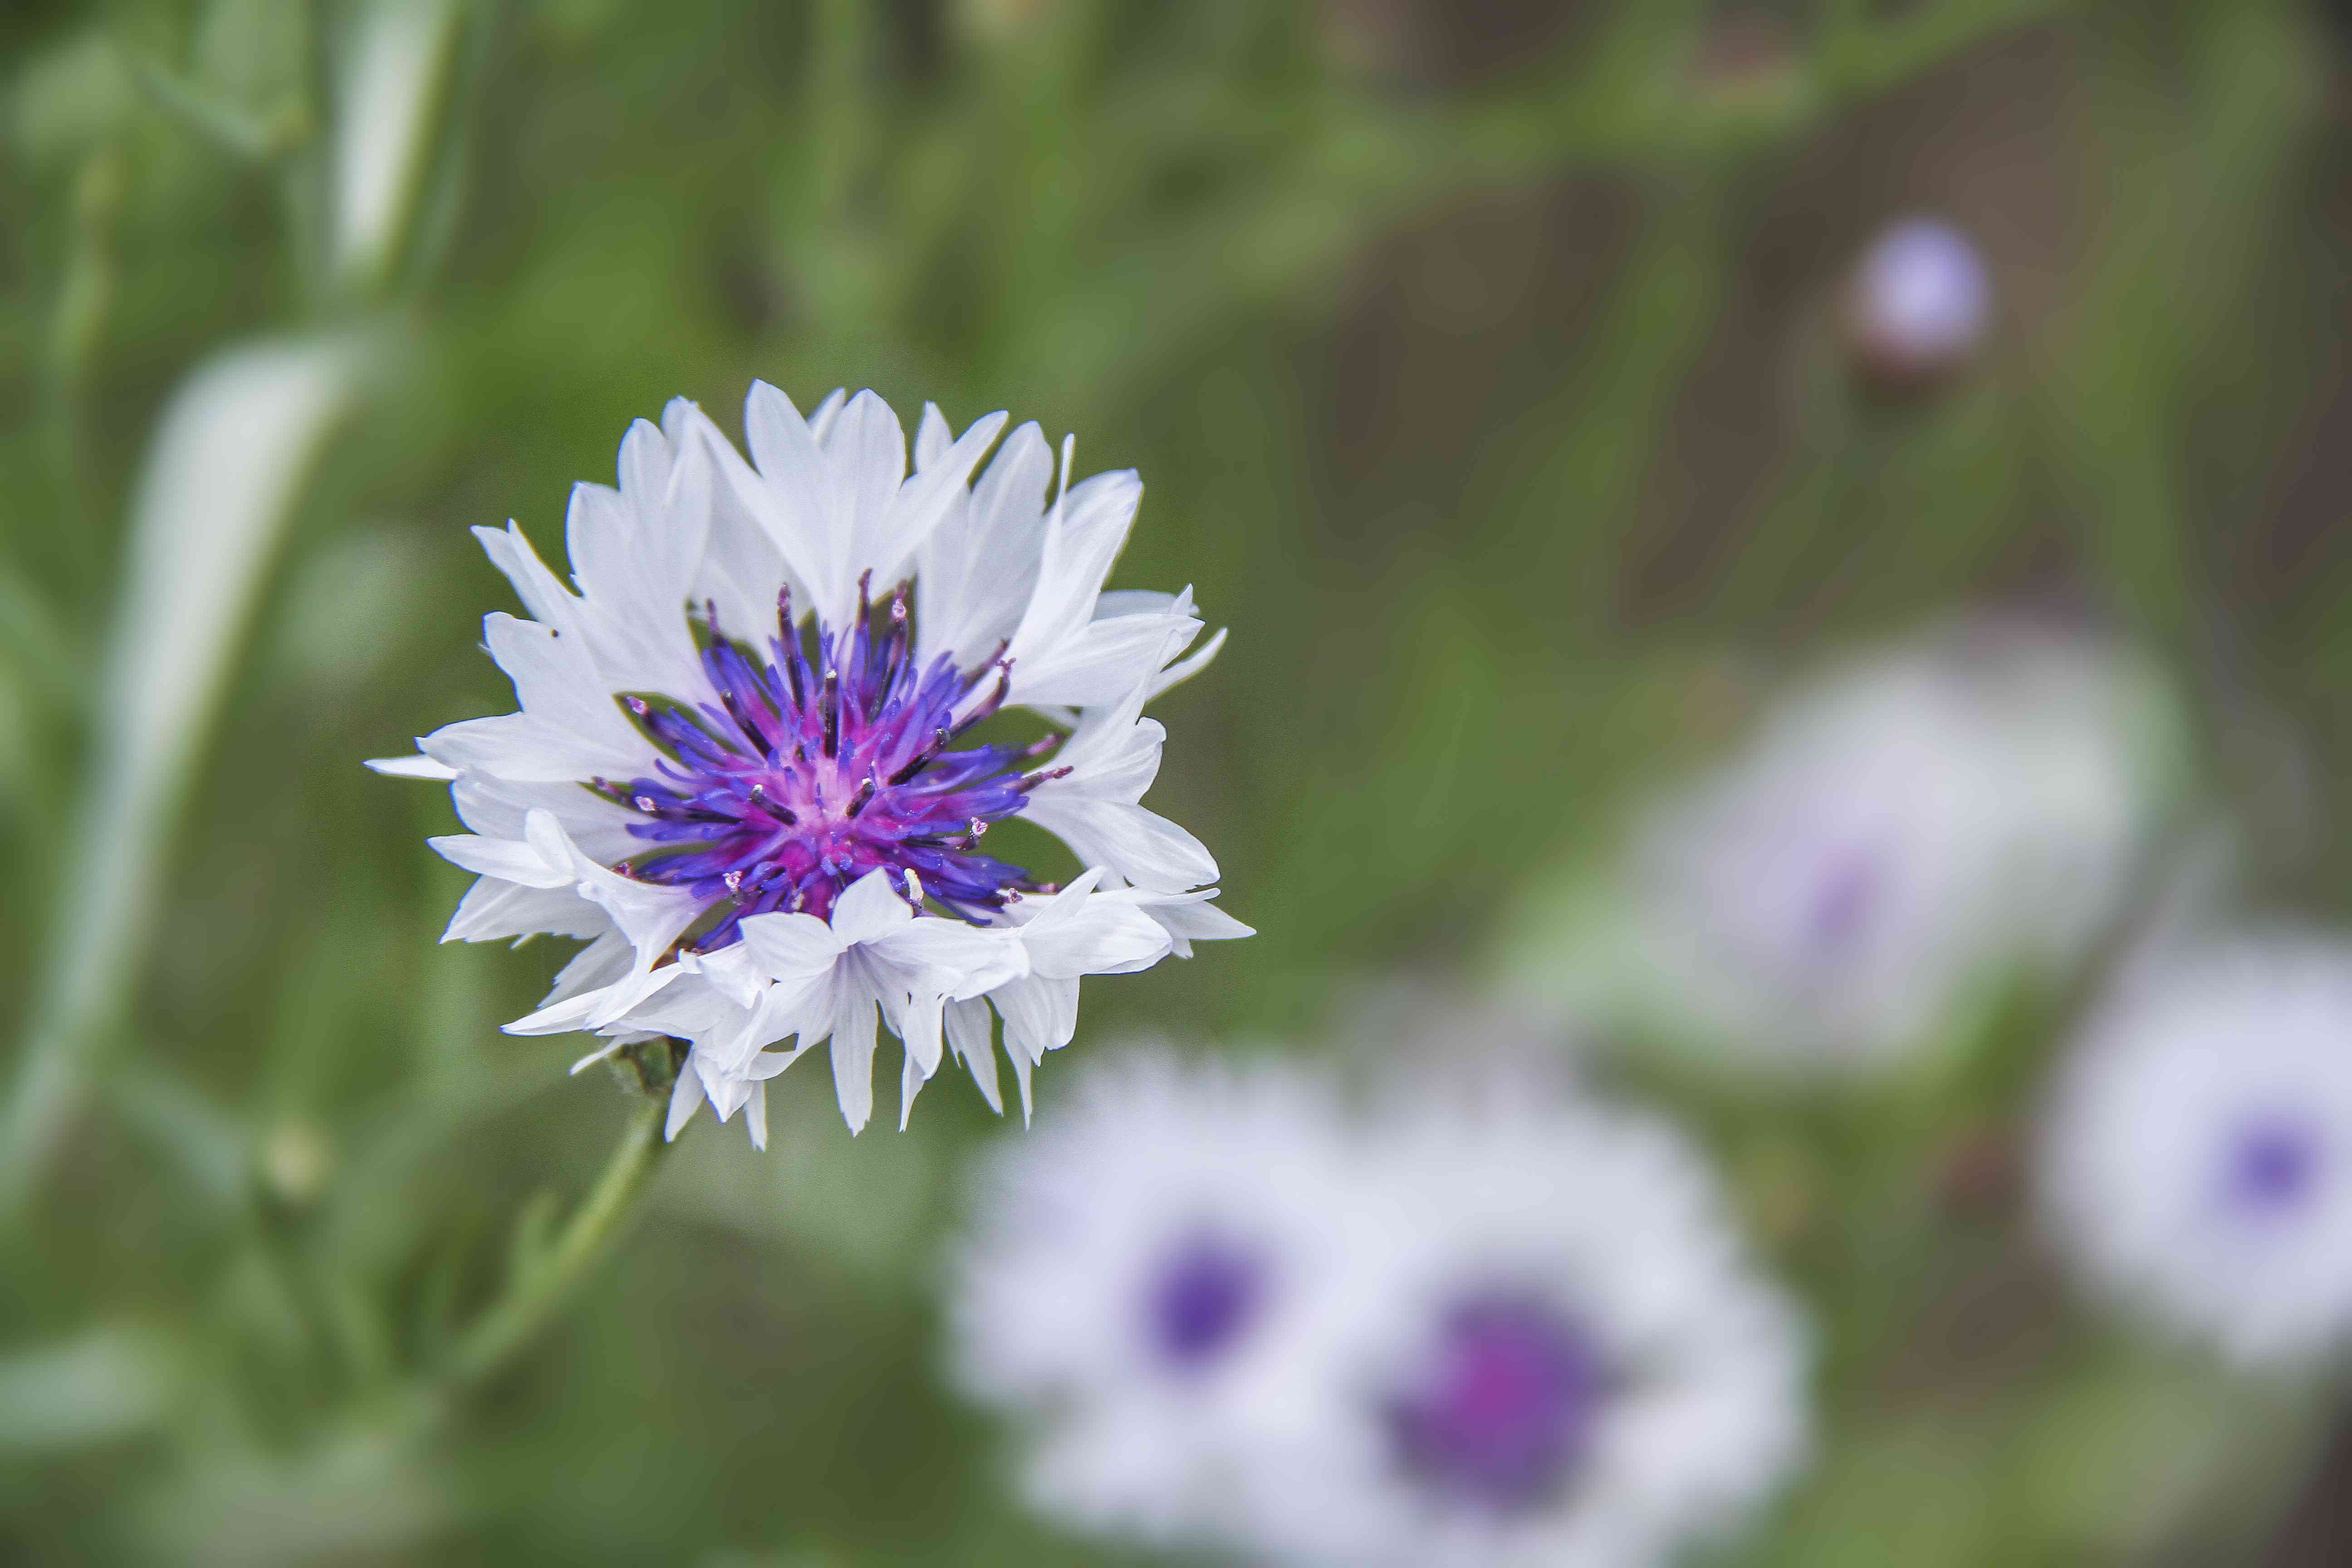 Cornflower or Bachelor's Button